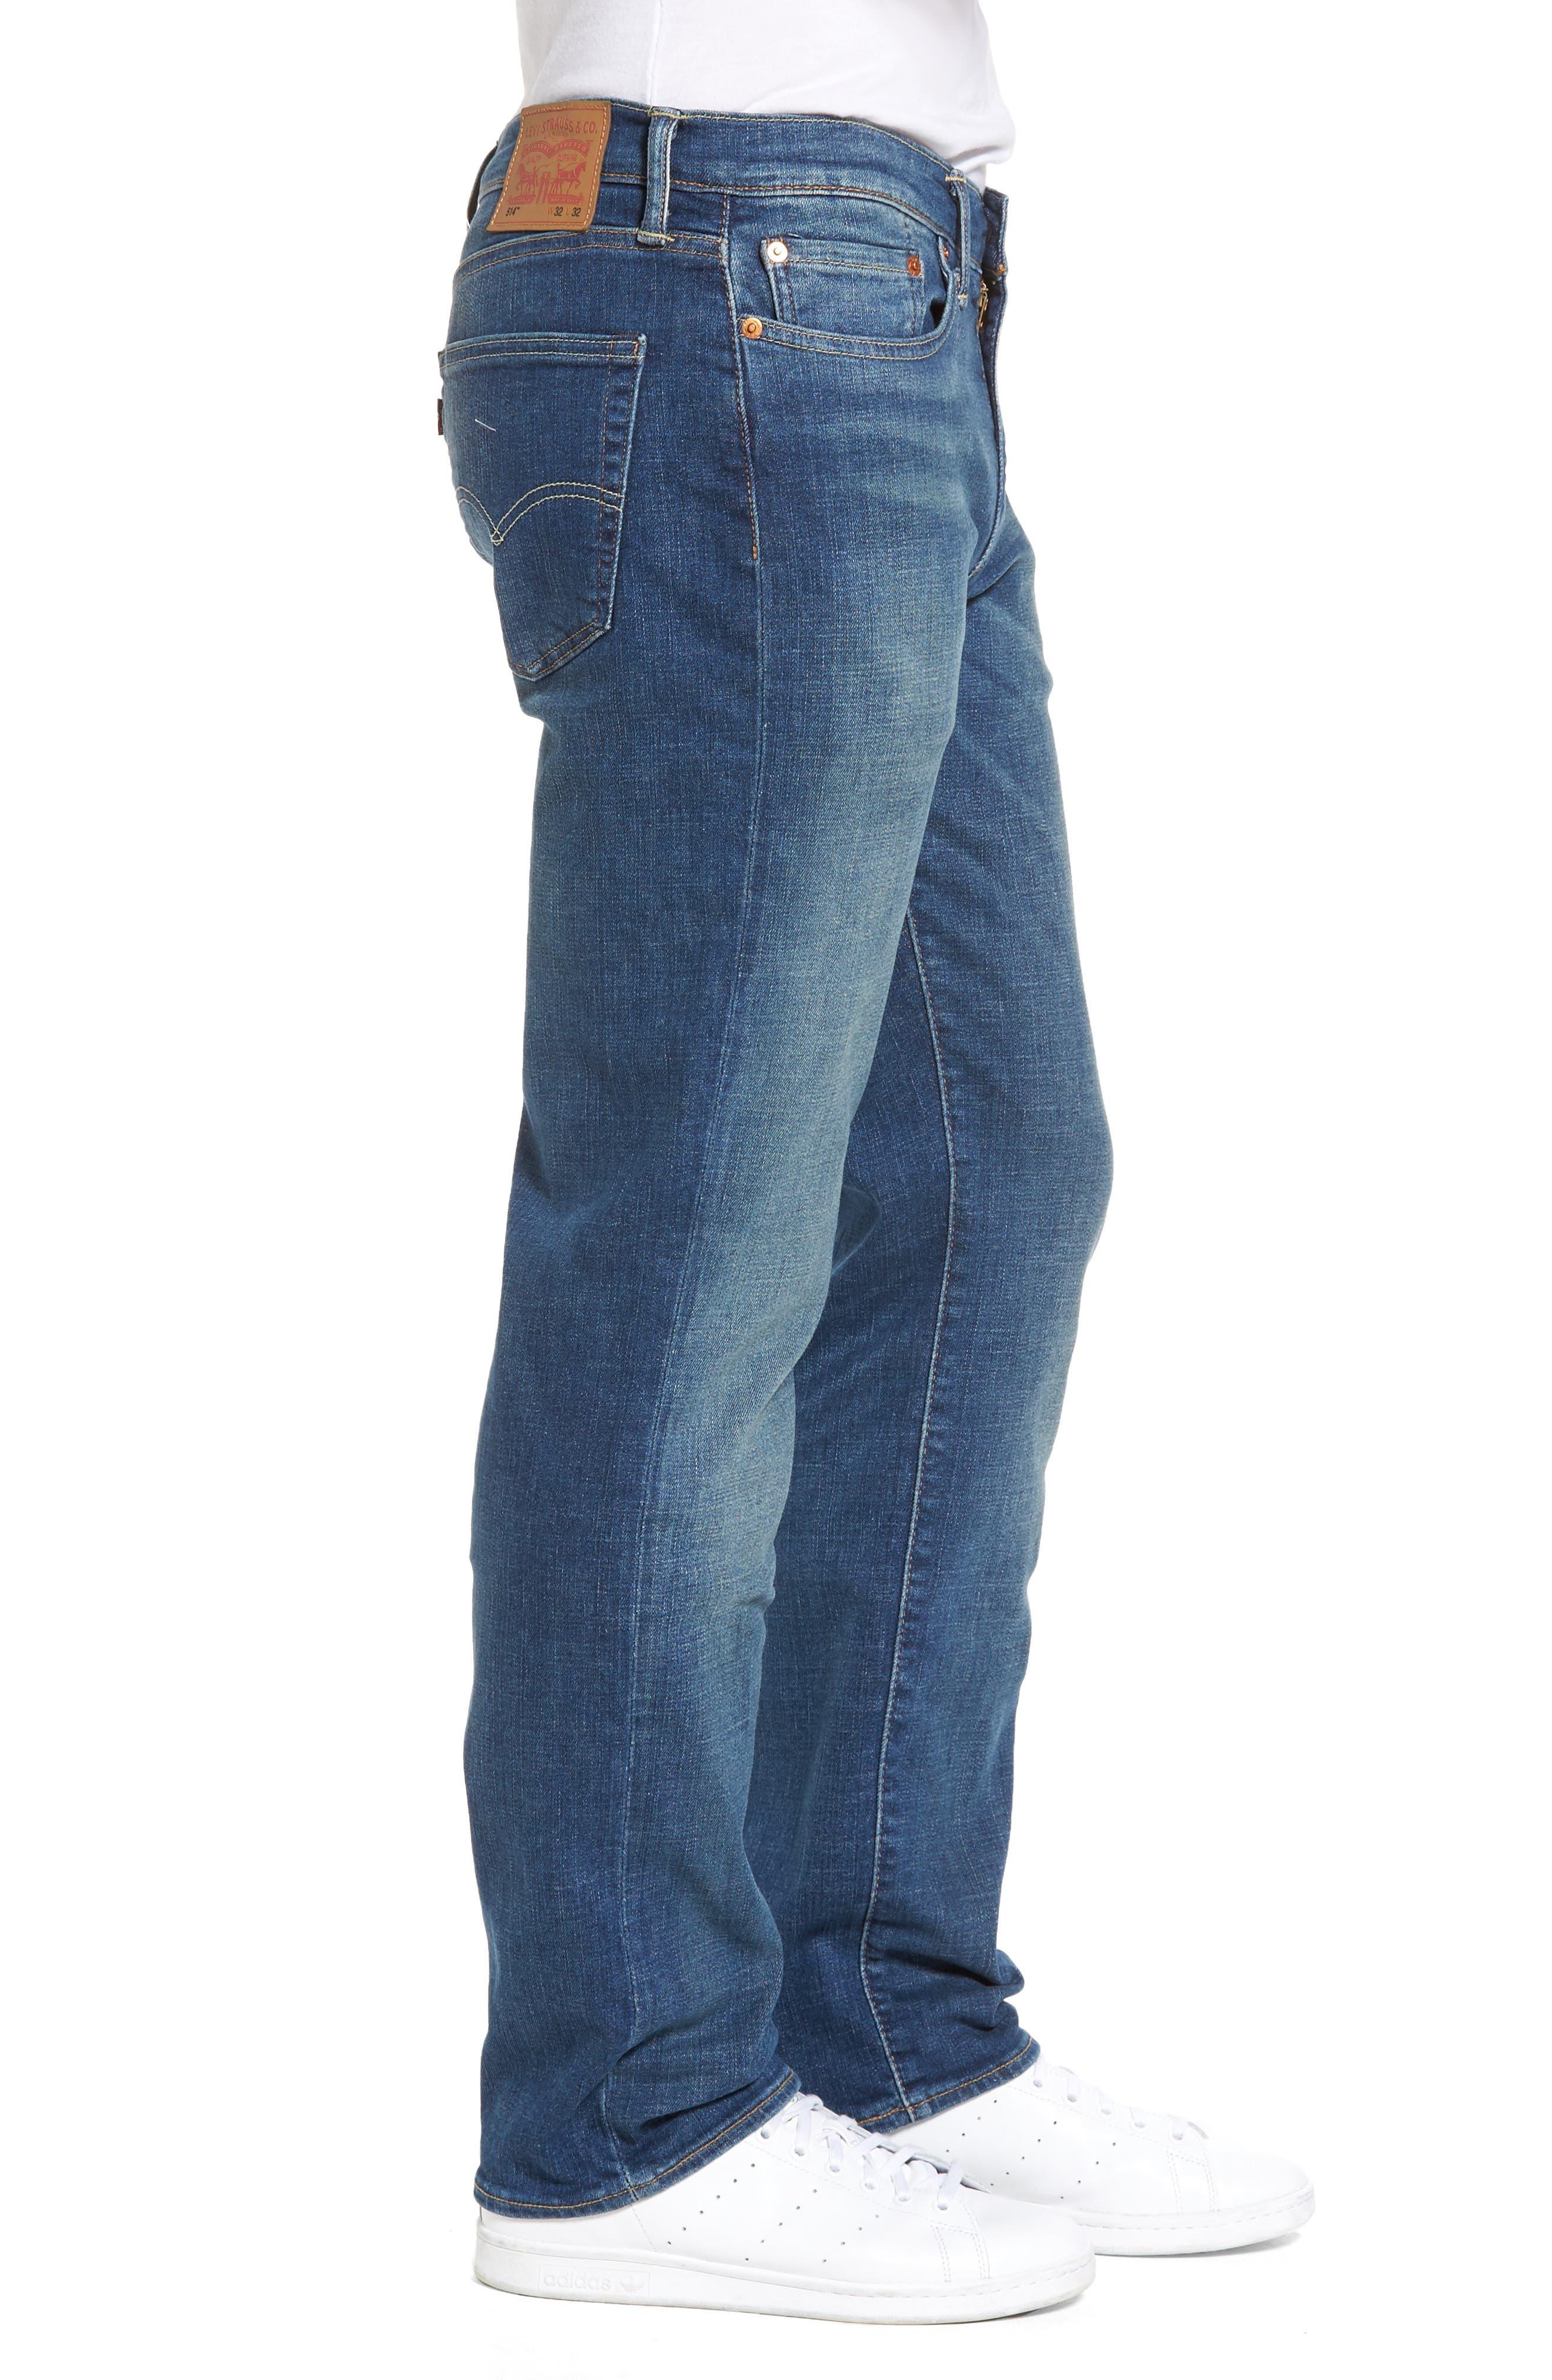 Alternate Image 3  - Levi's® 514™ Straight Leg Jeans (Yoke)